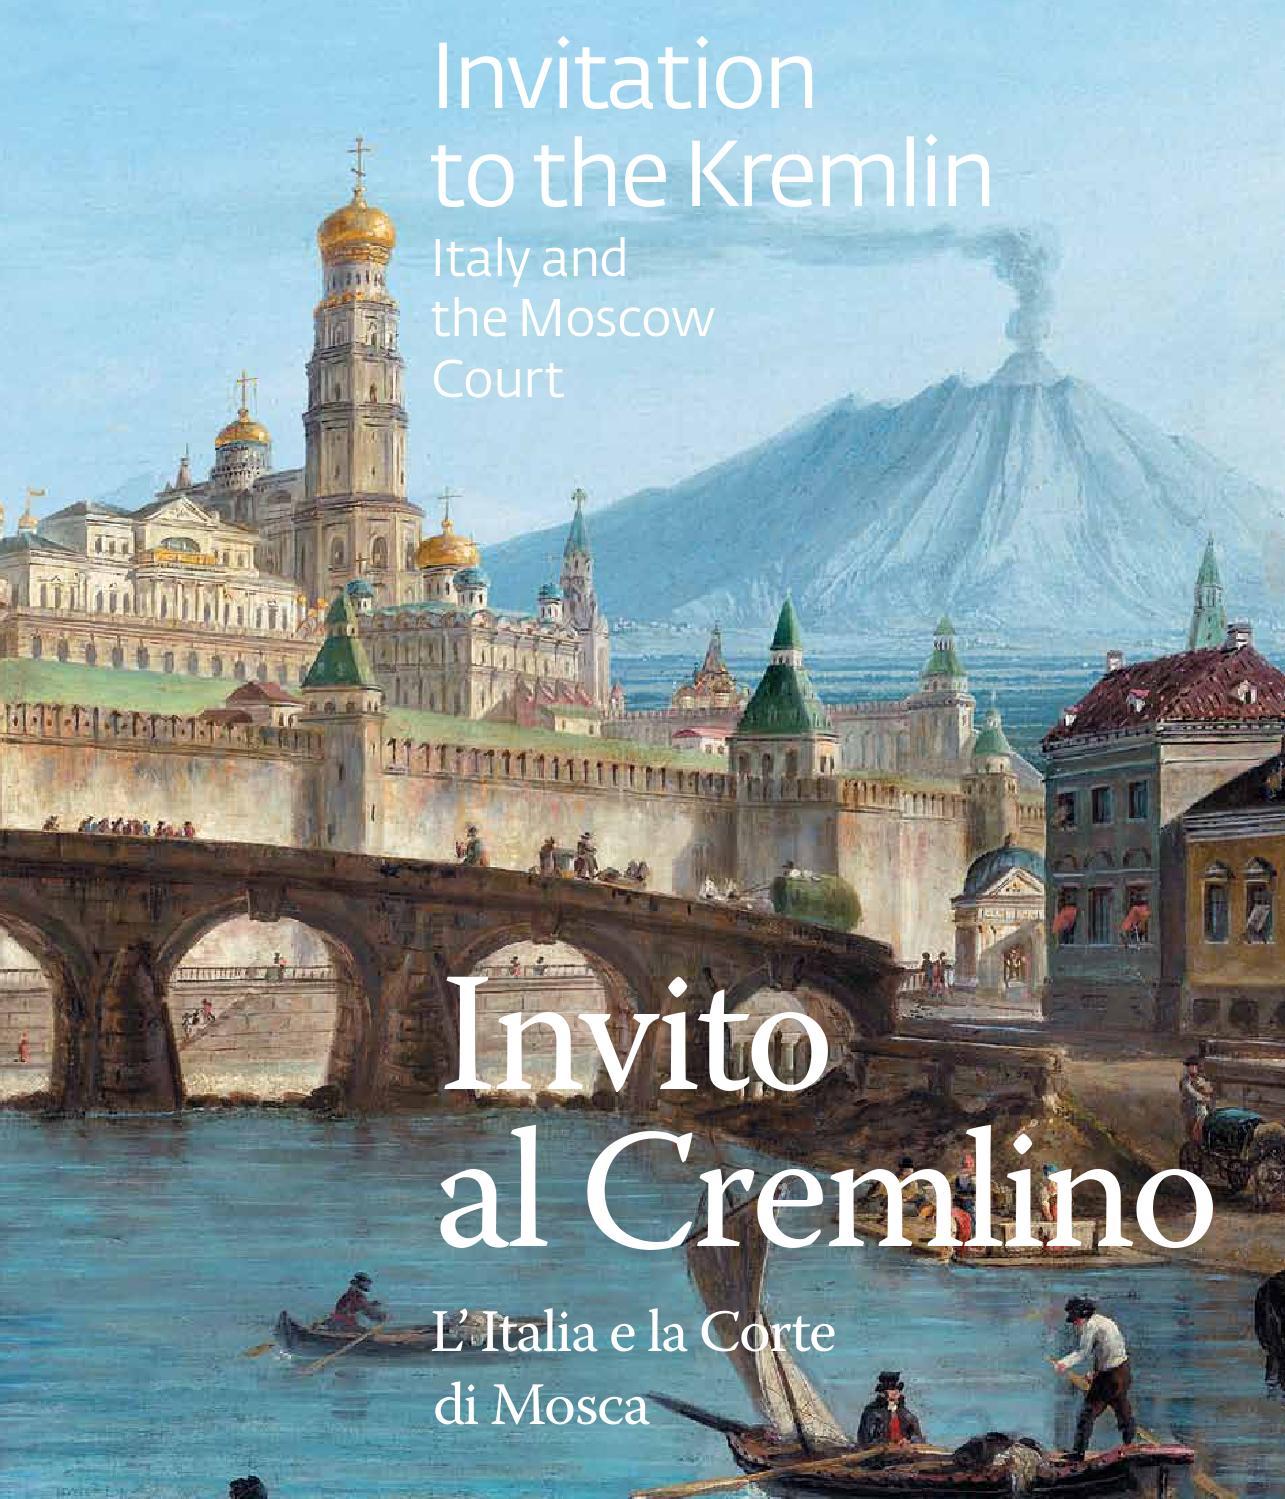 Invitation to the Kremlin by D. Chernogaev - issuu 334f5c7e5d4